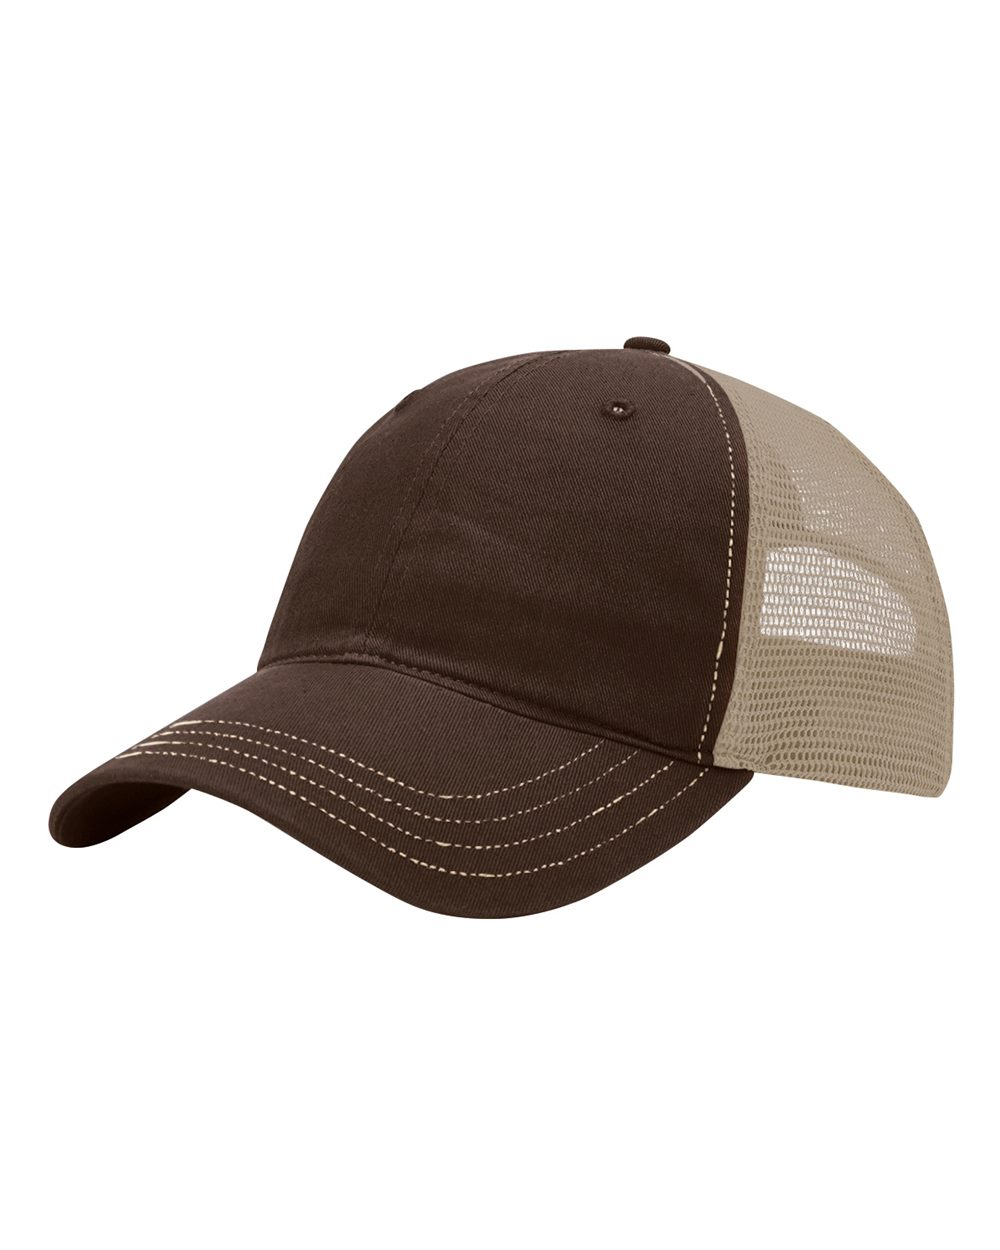 cc7e26c57a9eb Richardson 111 - Garment Washed Trucker Cap  5.75 - Headwear